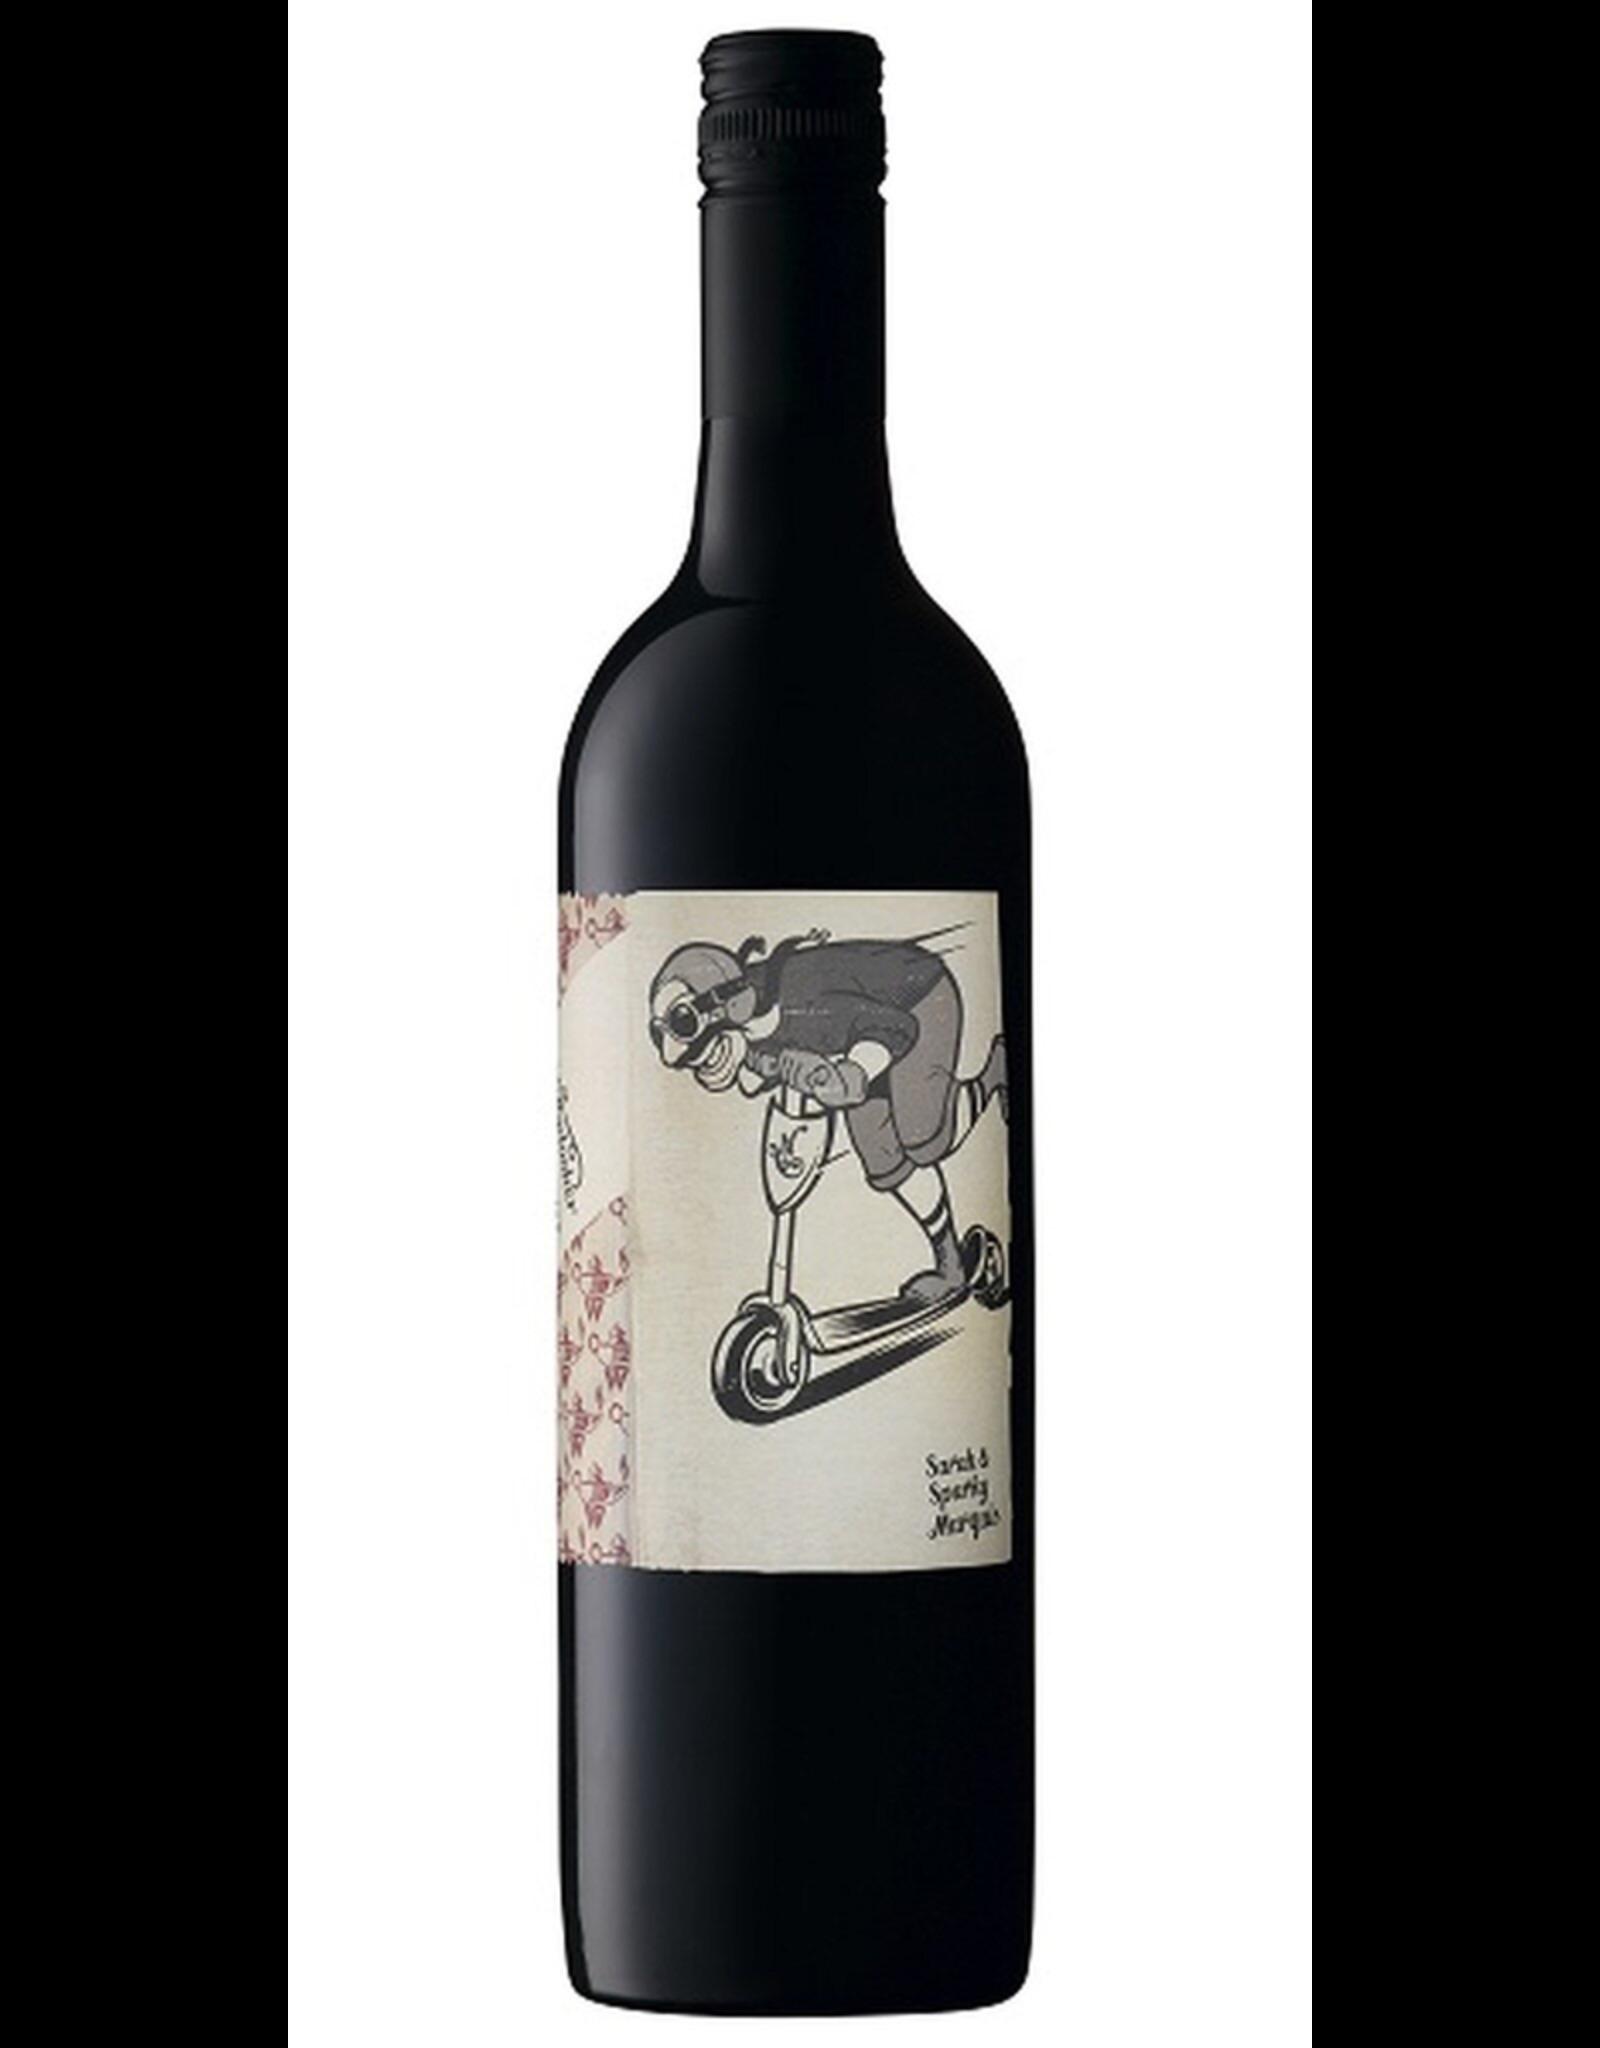 Red Wine Molly Dooker The Scooter, Merlot, McLaren Vale, South Australia, Australia, 17% Alc, CTnr